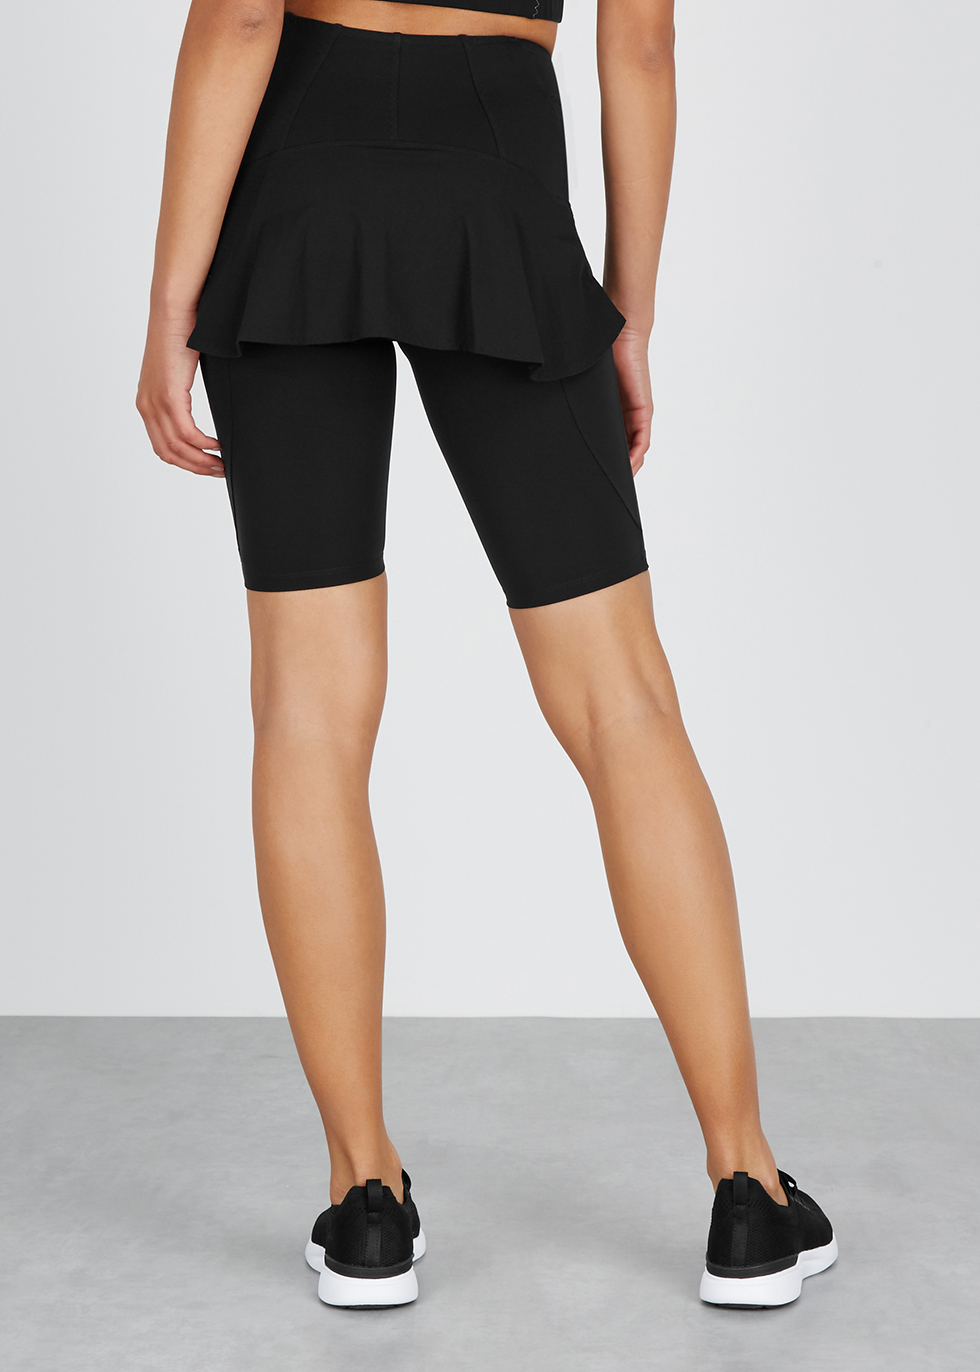 Algol 2.0 skirt-back shorts - Sàpopa